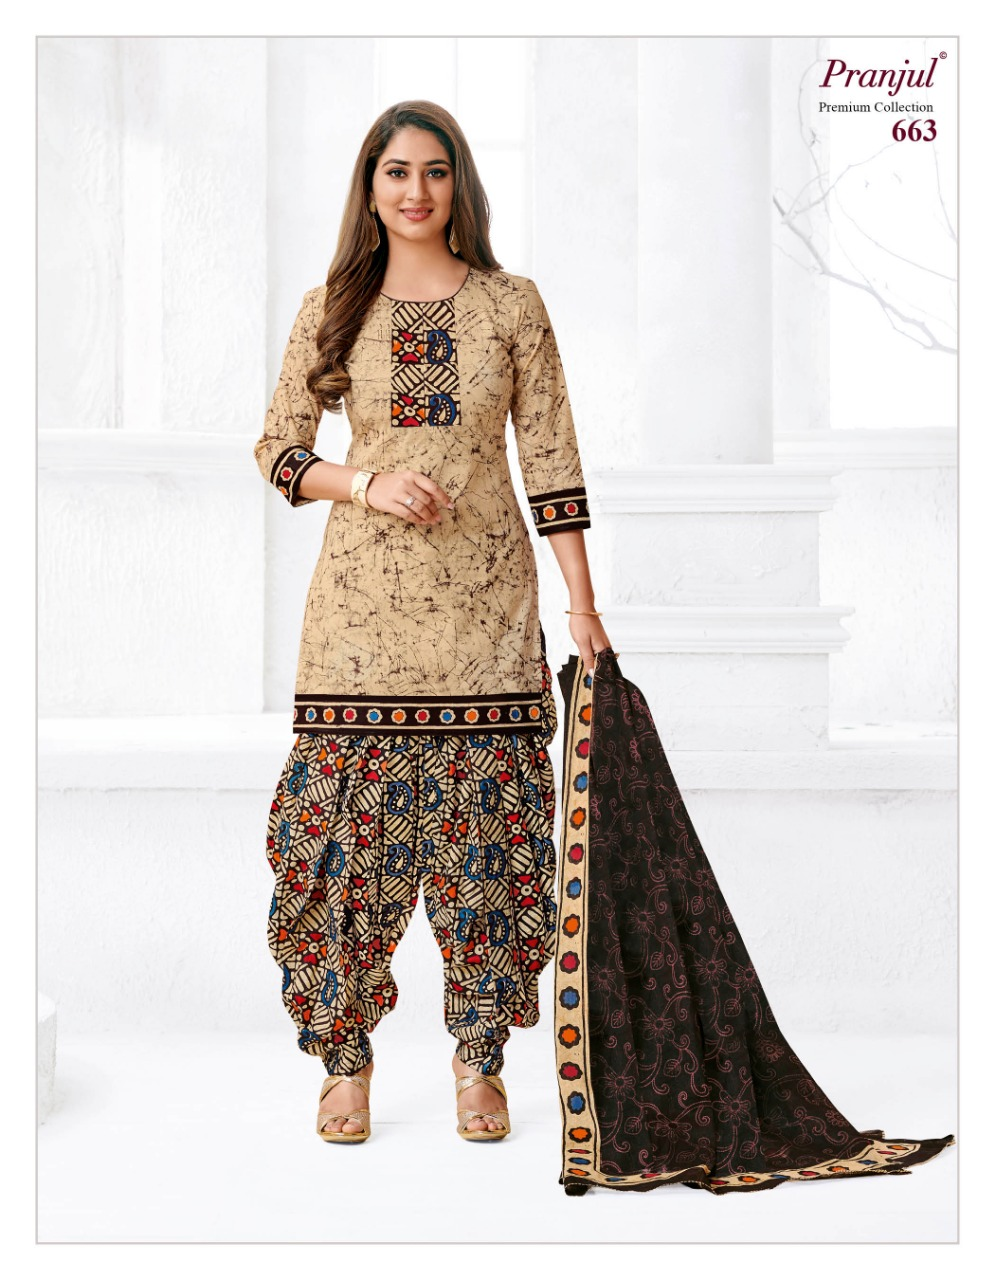 Pranjul Priyanka Vol 6 Premium Collection Readymade Suit Wholesale Catalog 15 Pcs 5 - Pranjul Priyanka Vol 6 Premium Collection Readymade Suit Wholesale Catalog 15 Pcs